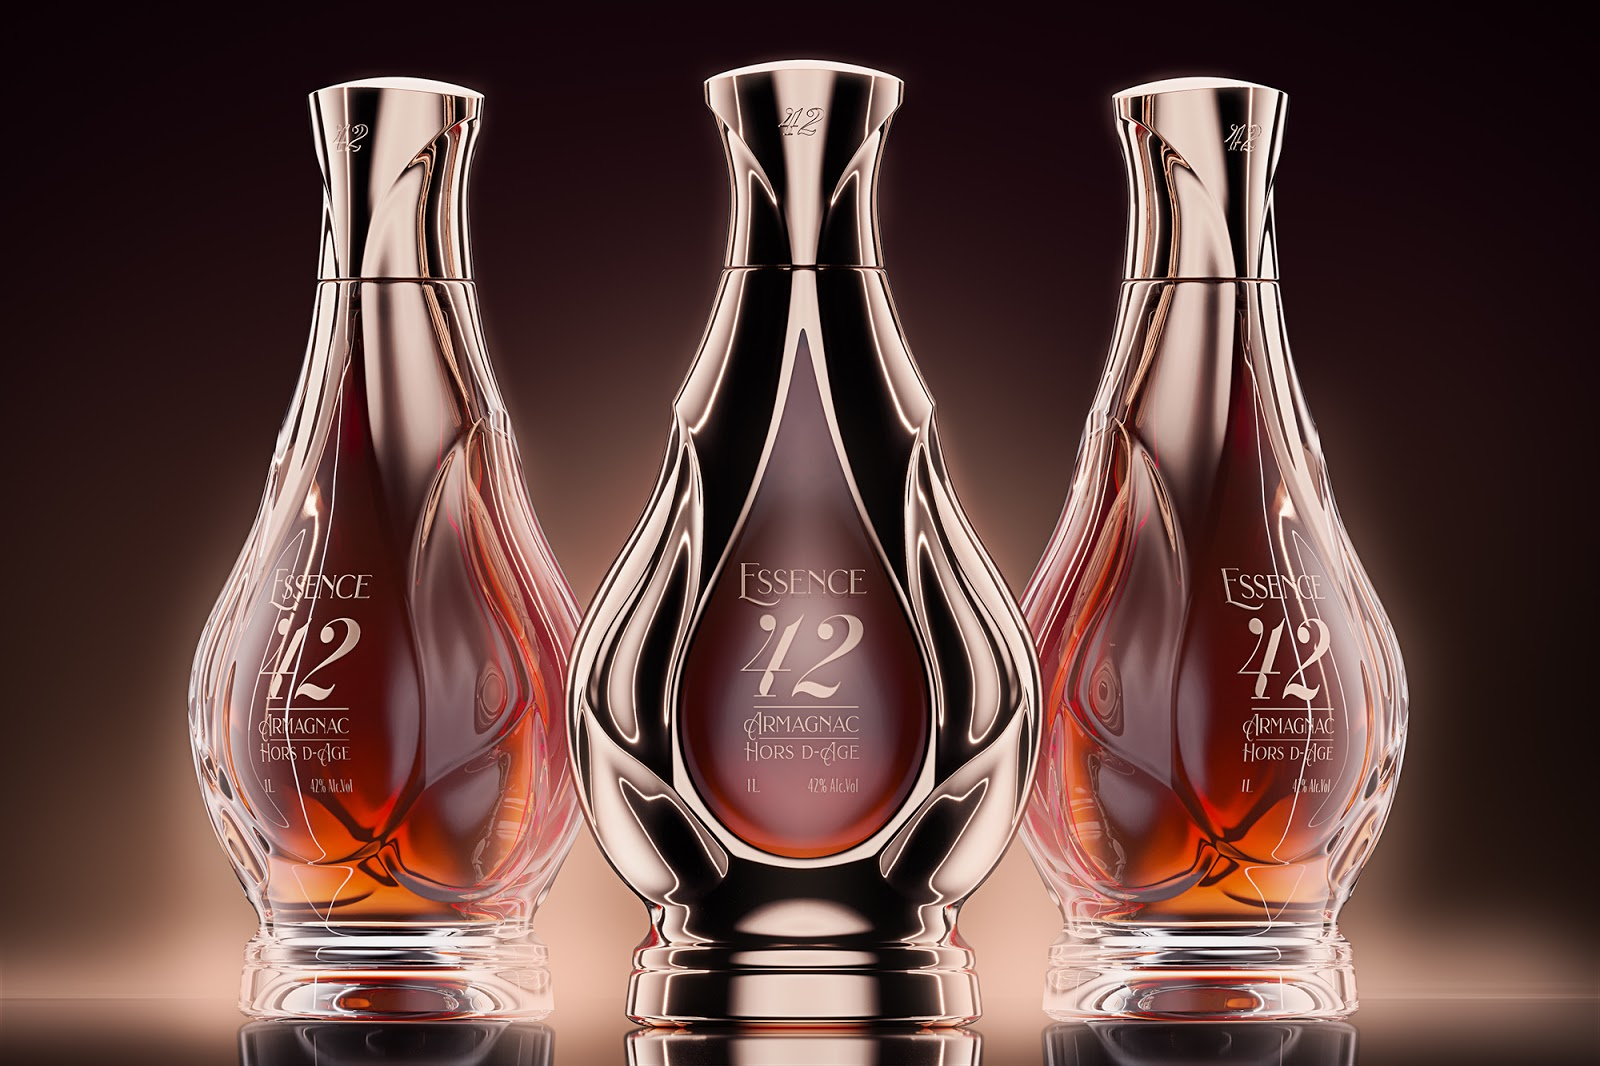 Essence 42酒包装设计&瓶型设计